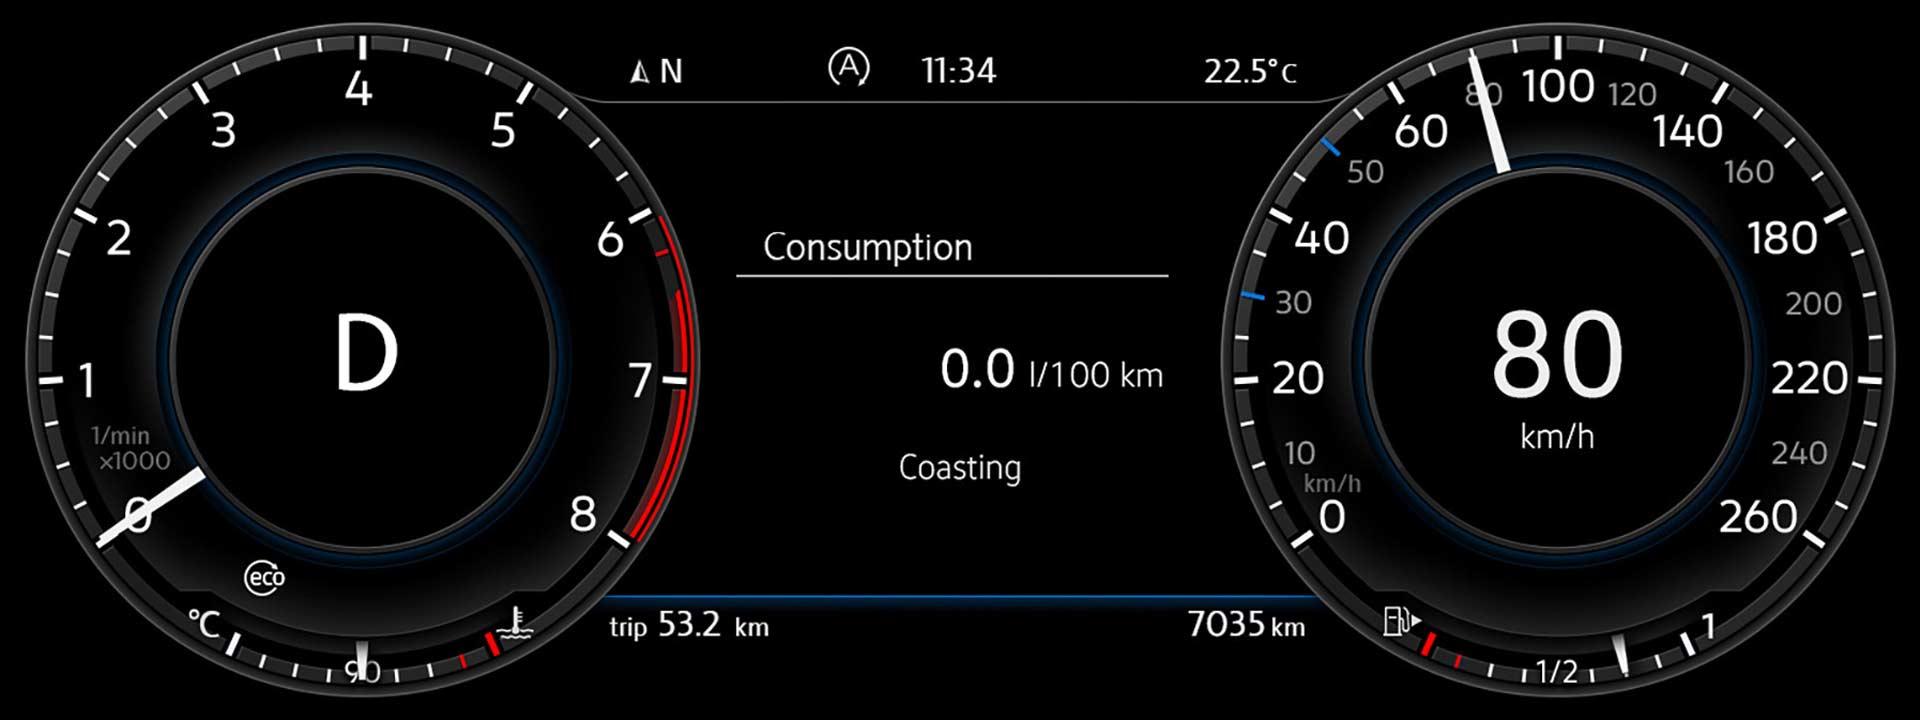 Volkswagen-Golf-130-PS-1.5-TSI-ACT-BlueMotion-instrument-cluster